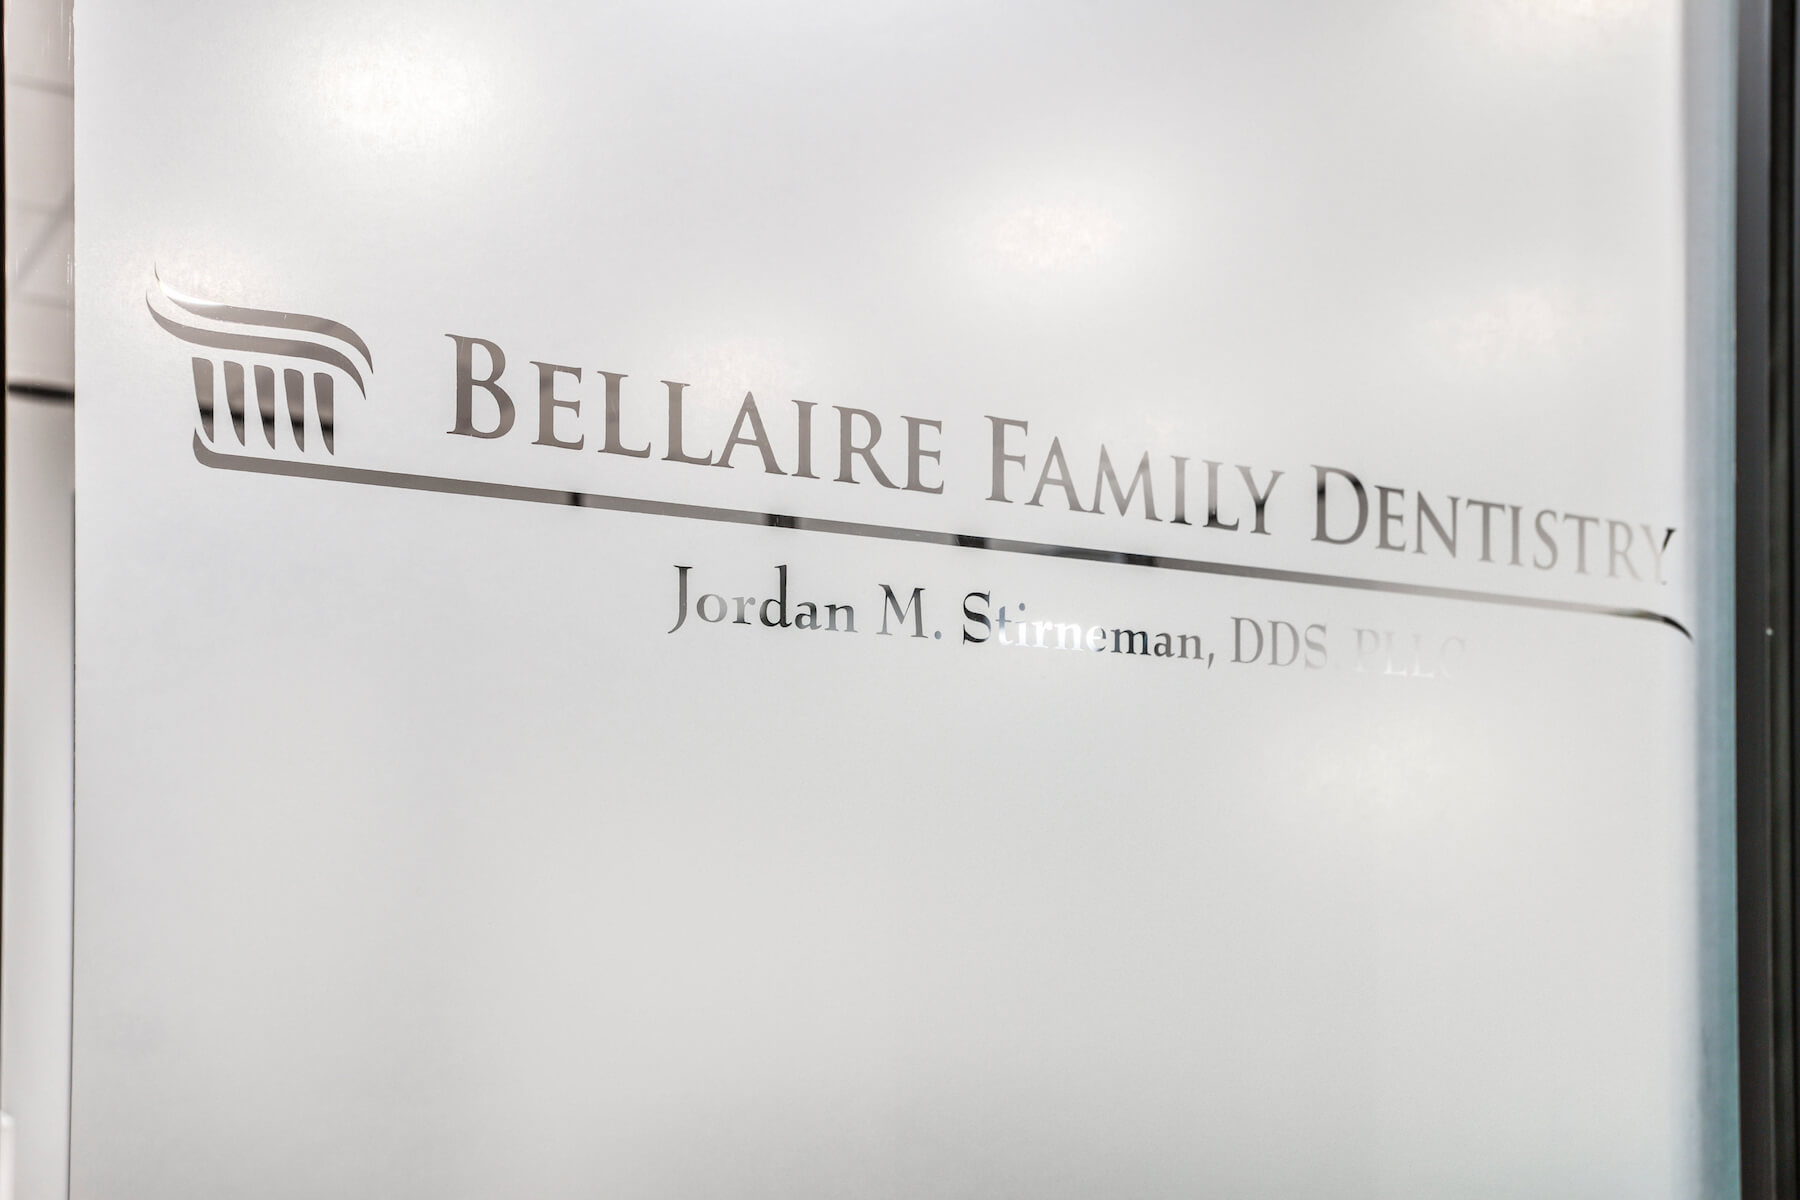 bellaire_dental_16